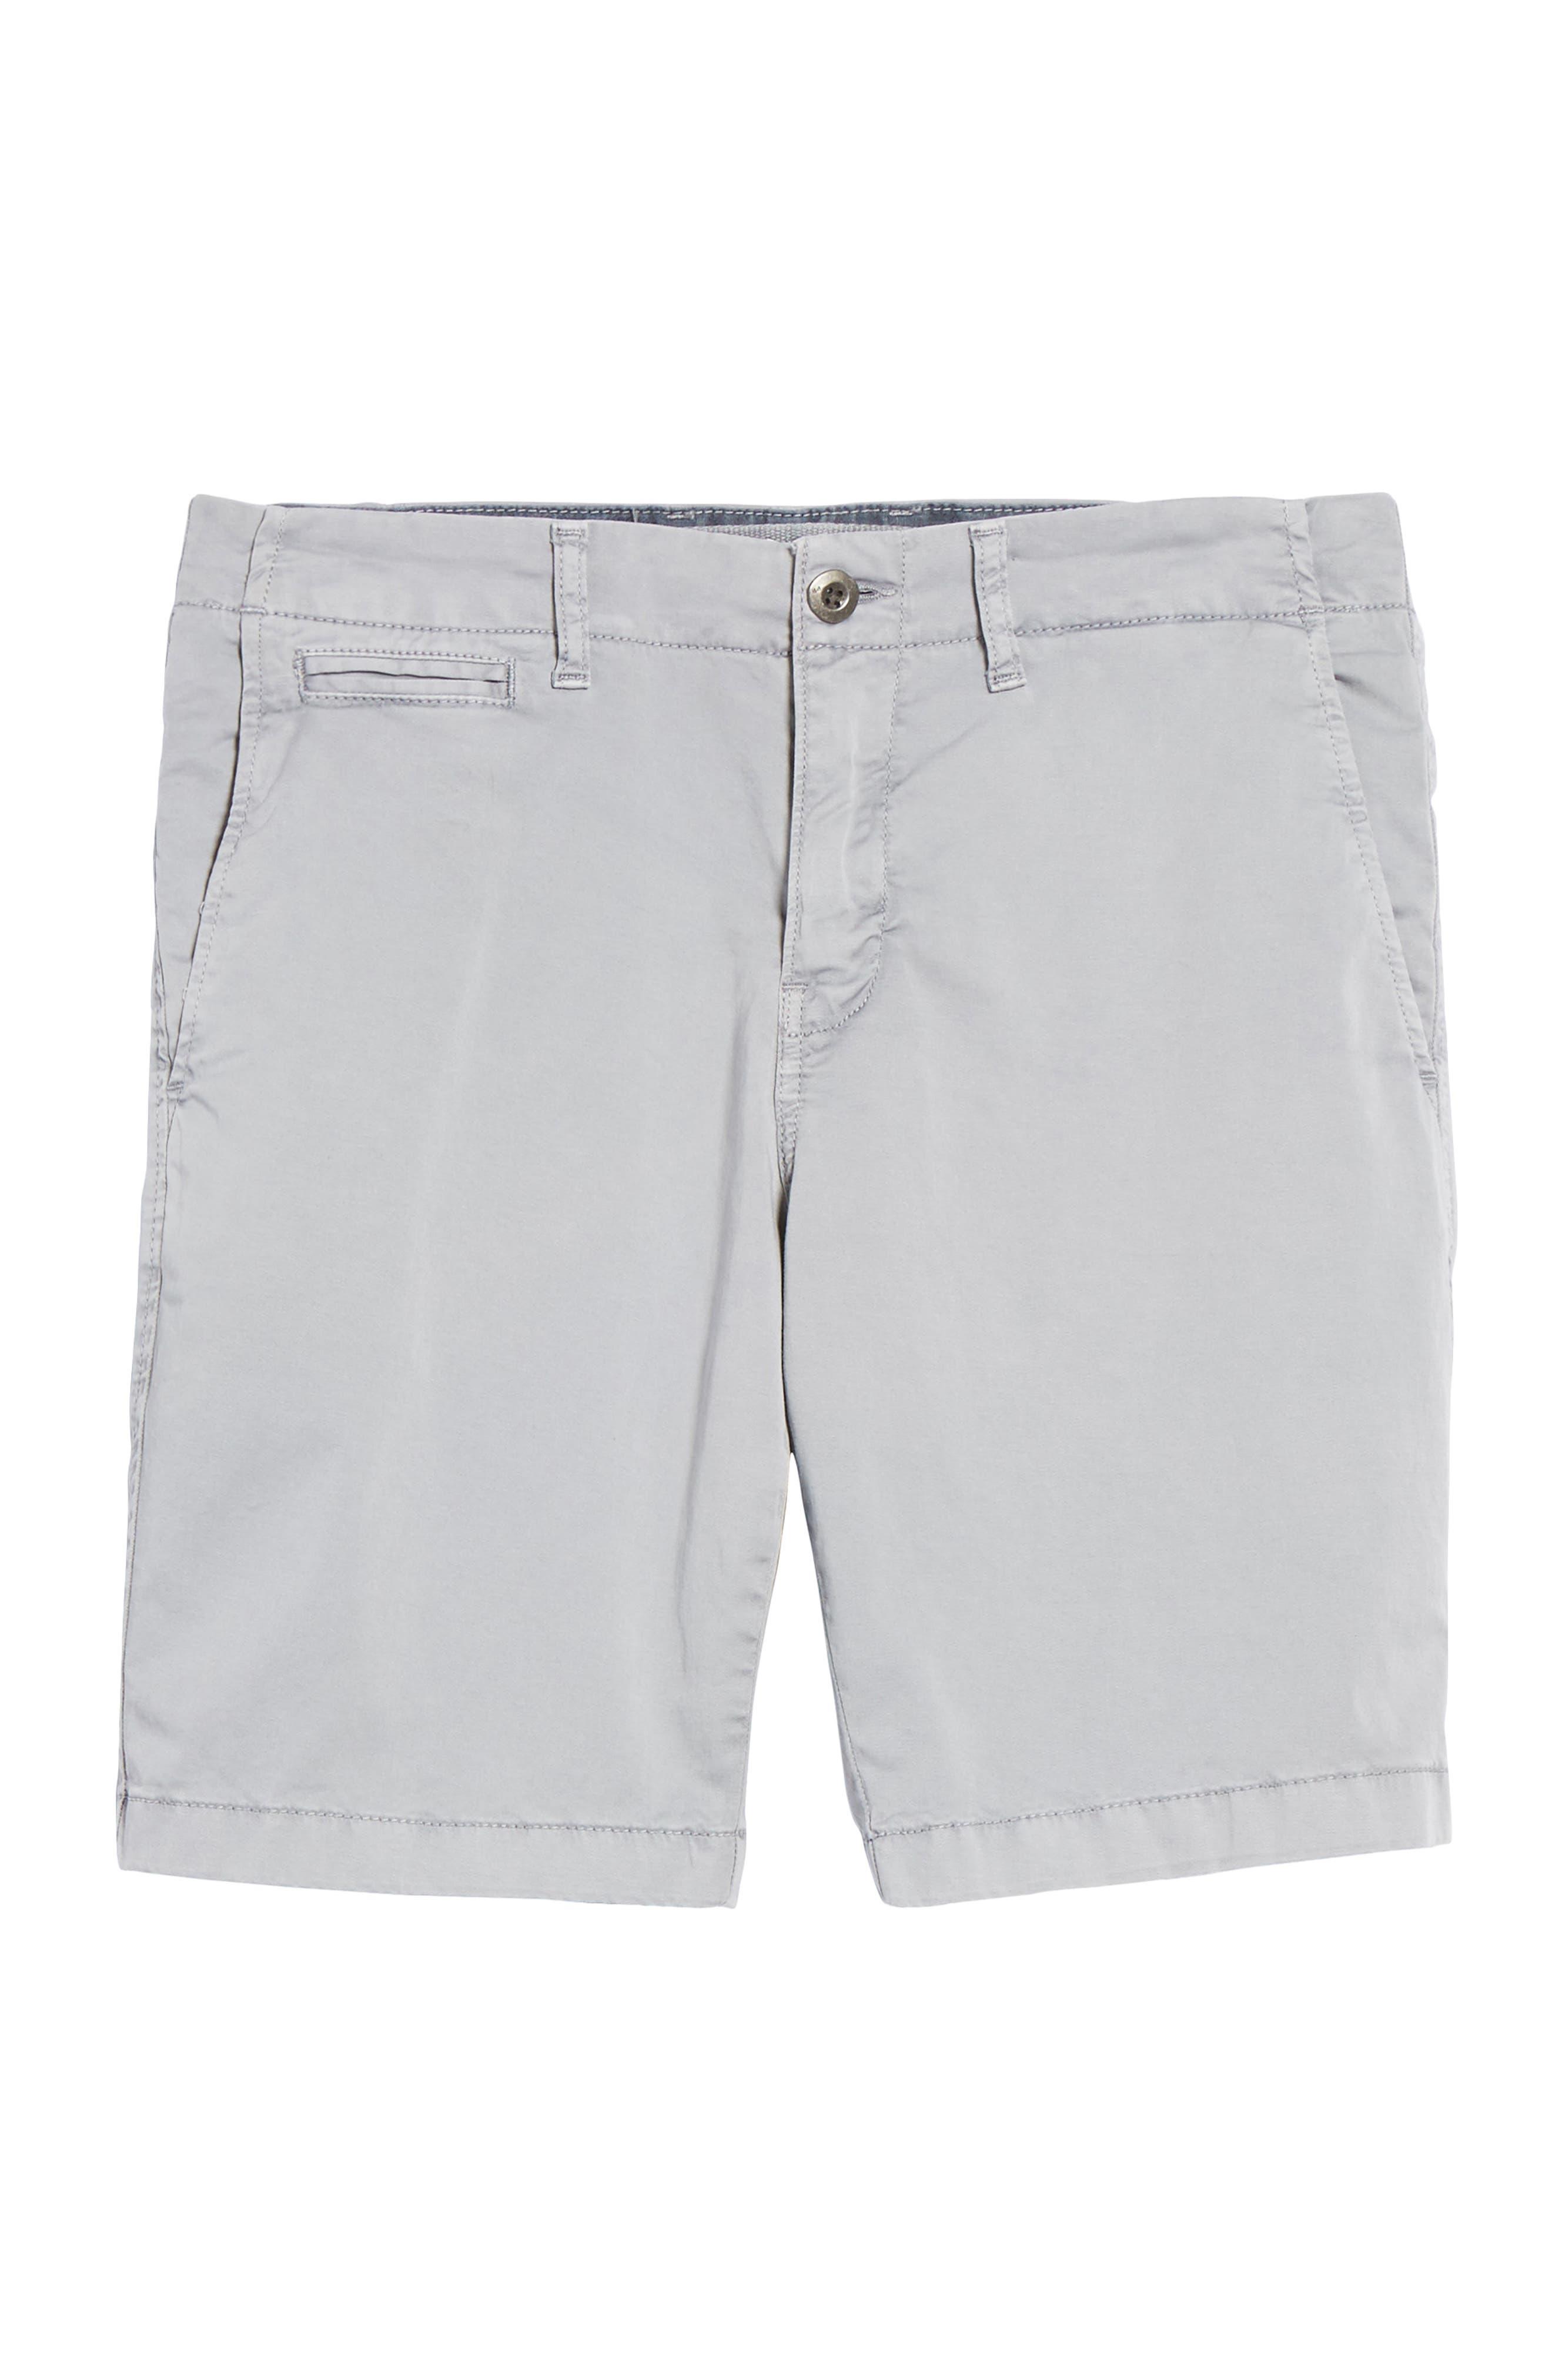 St. Barts Twill Shorts,                             Alternate thumbnail 63, color,